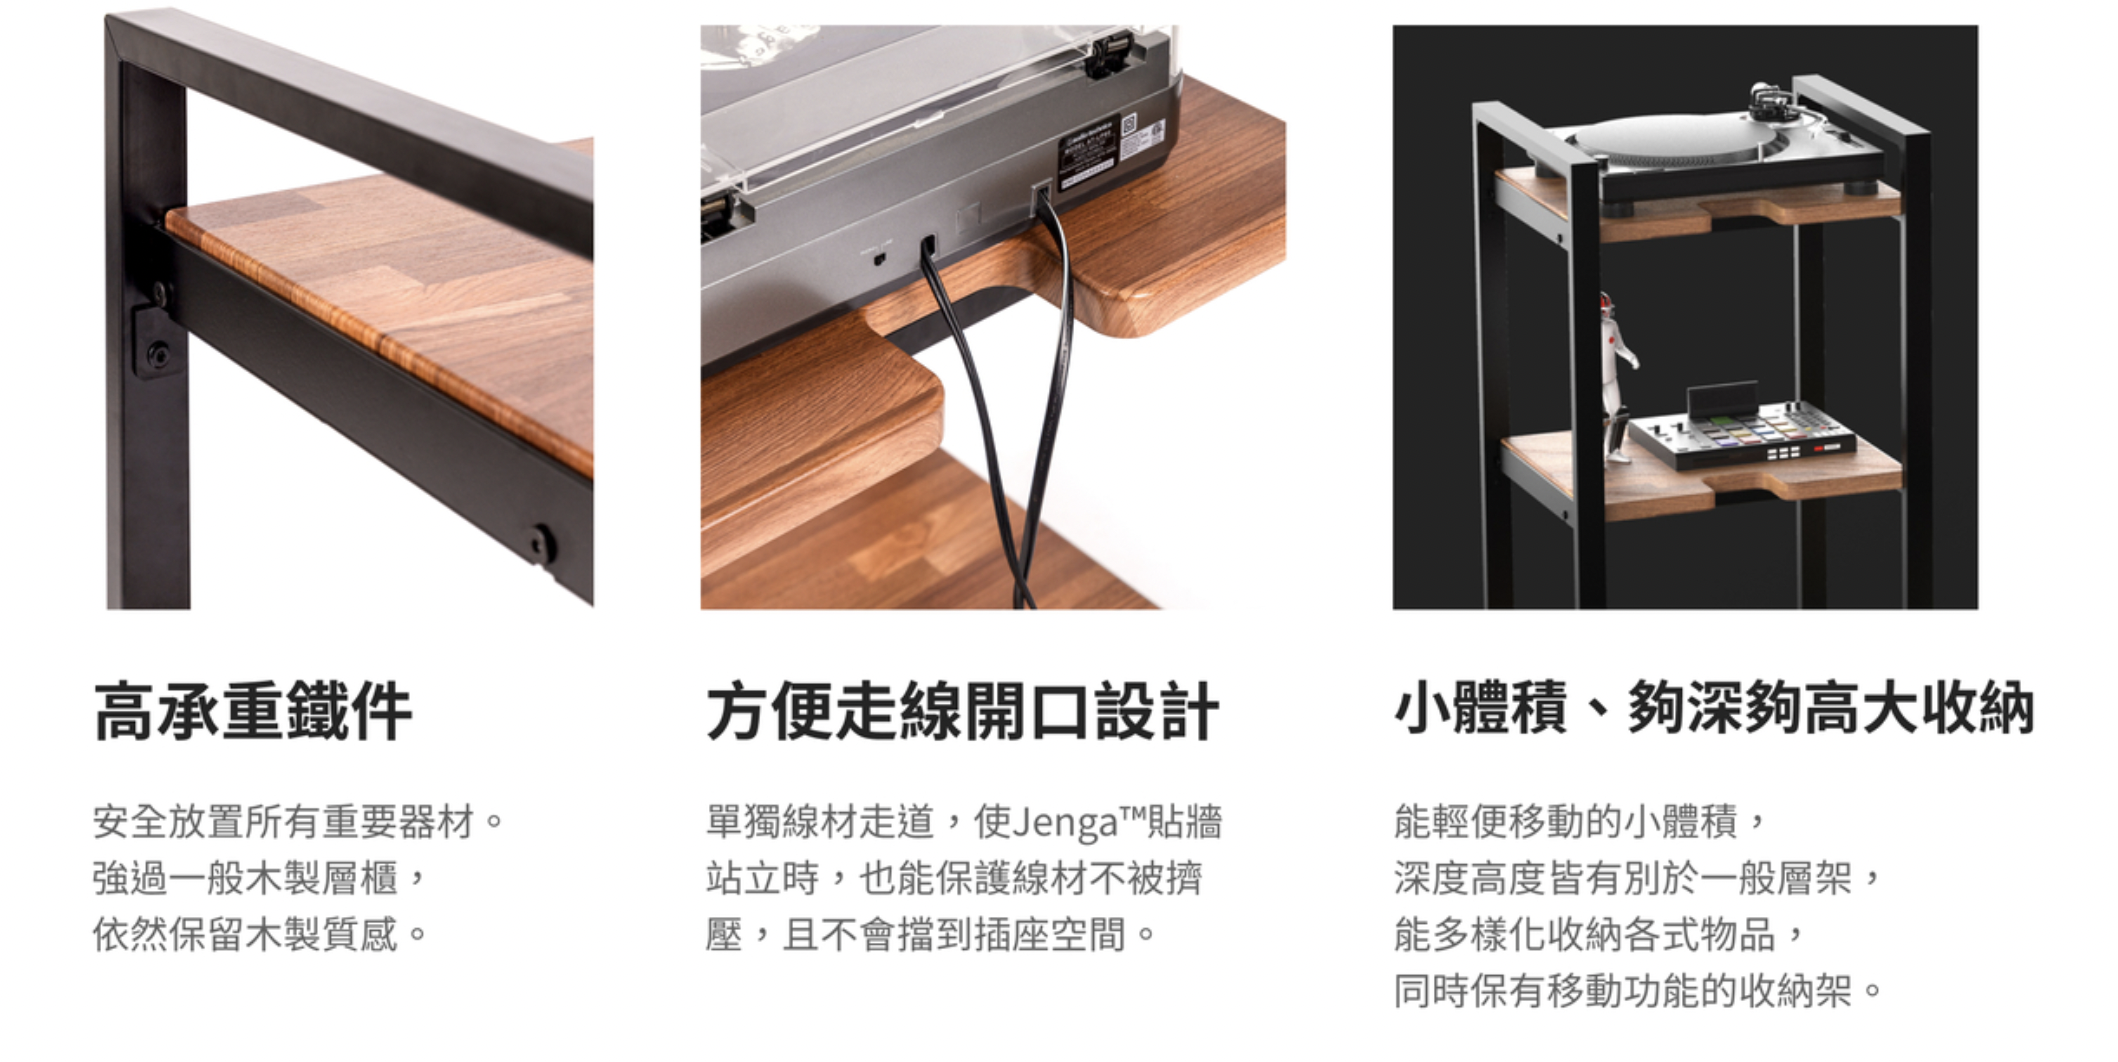 Wavebone JengaTM 層架系列 (兩層層架 木紋層板